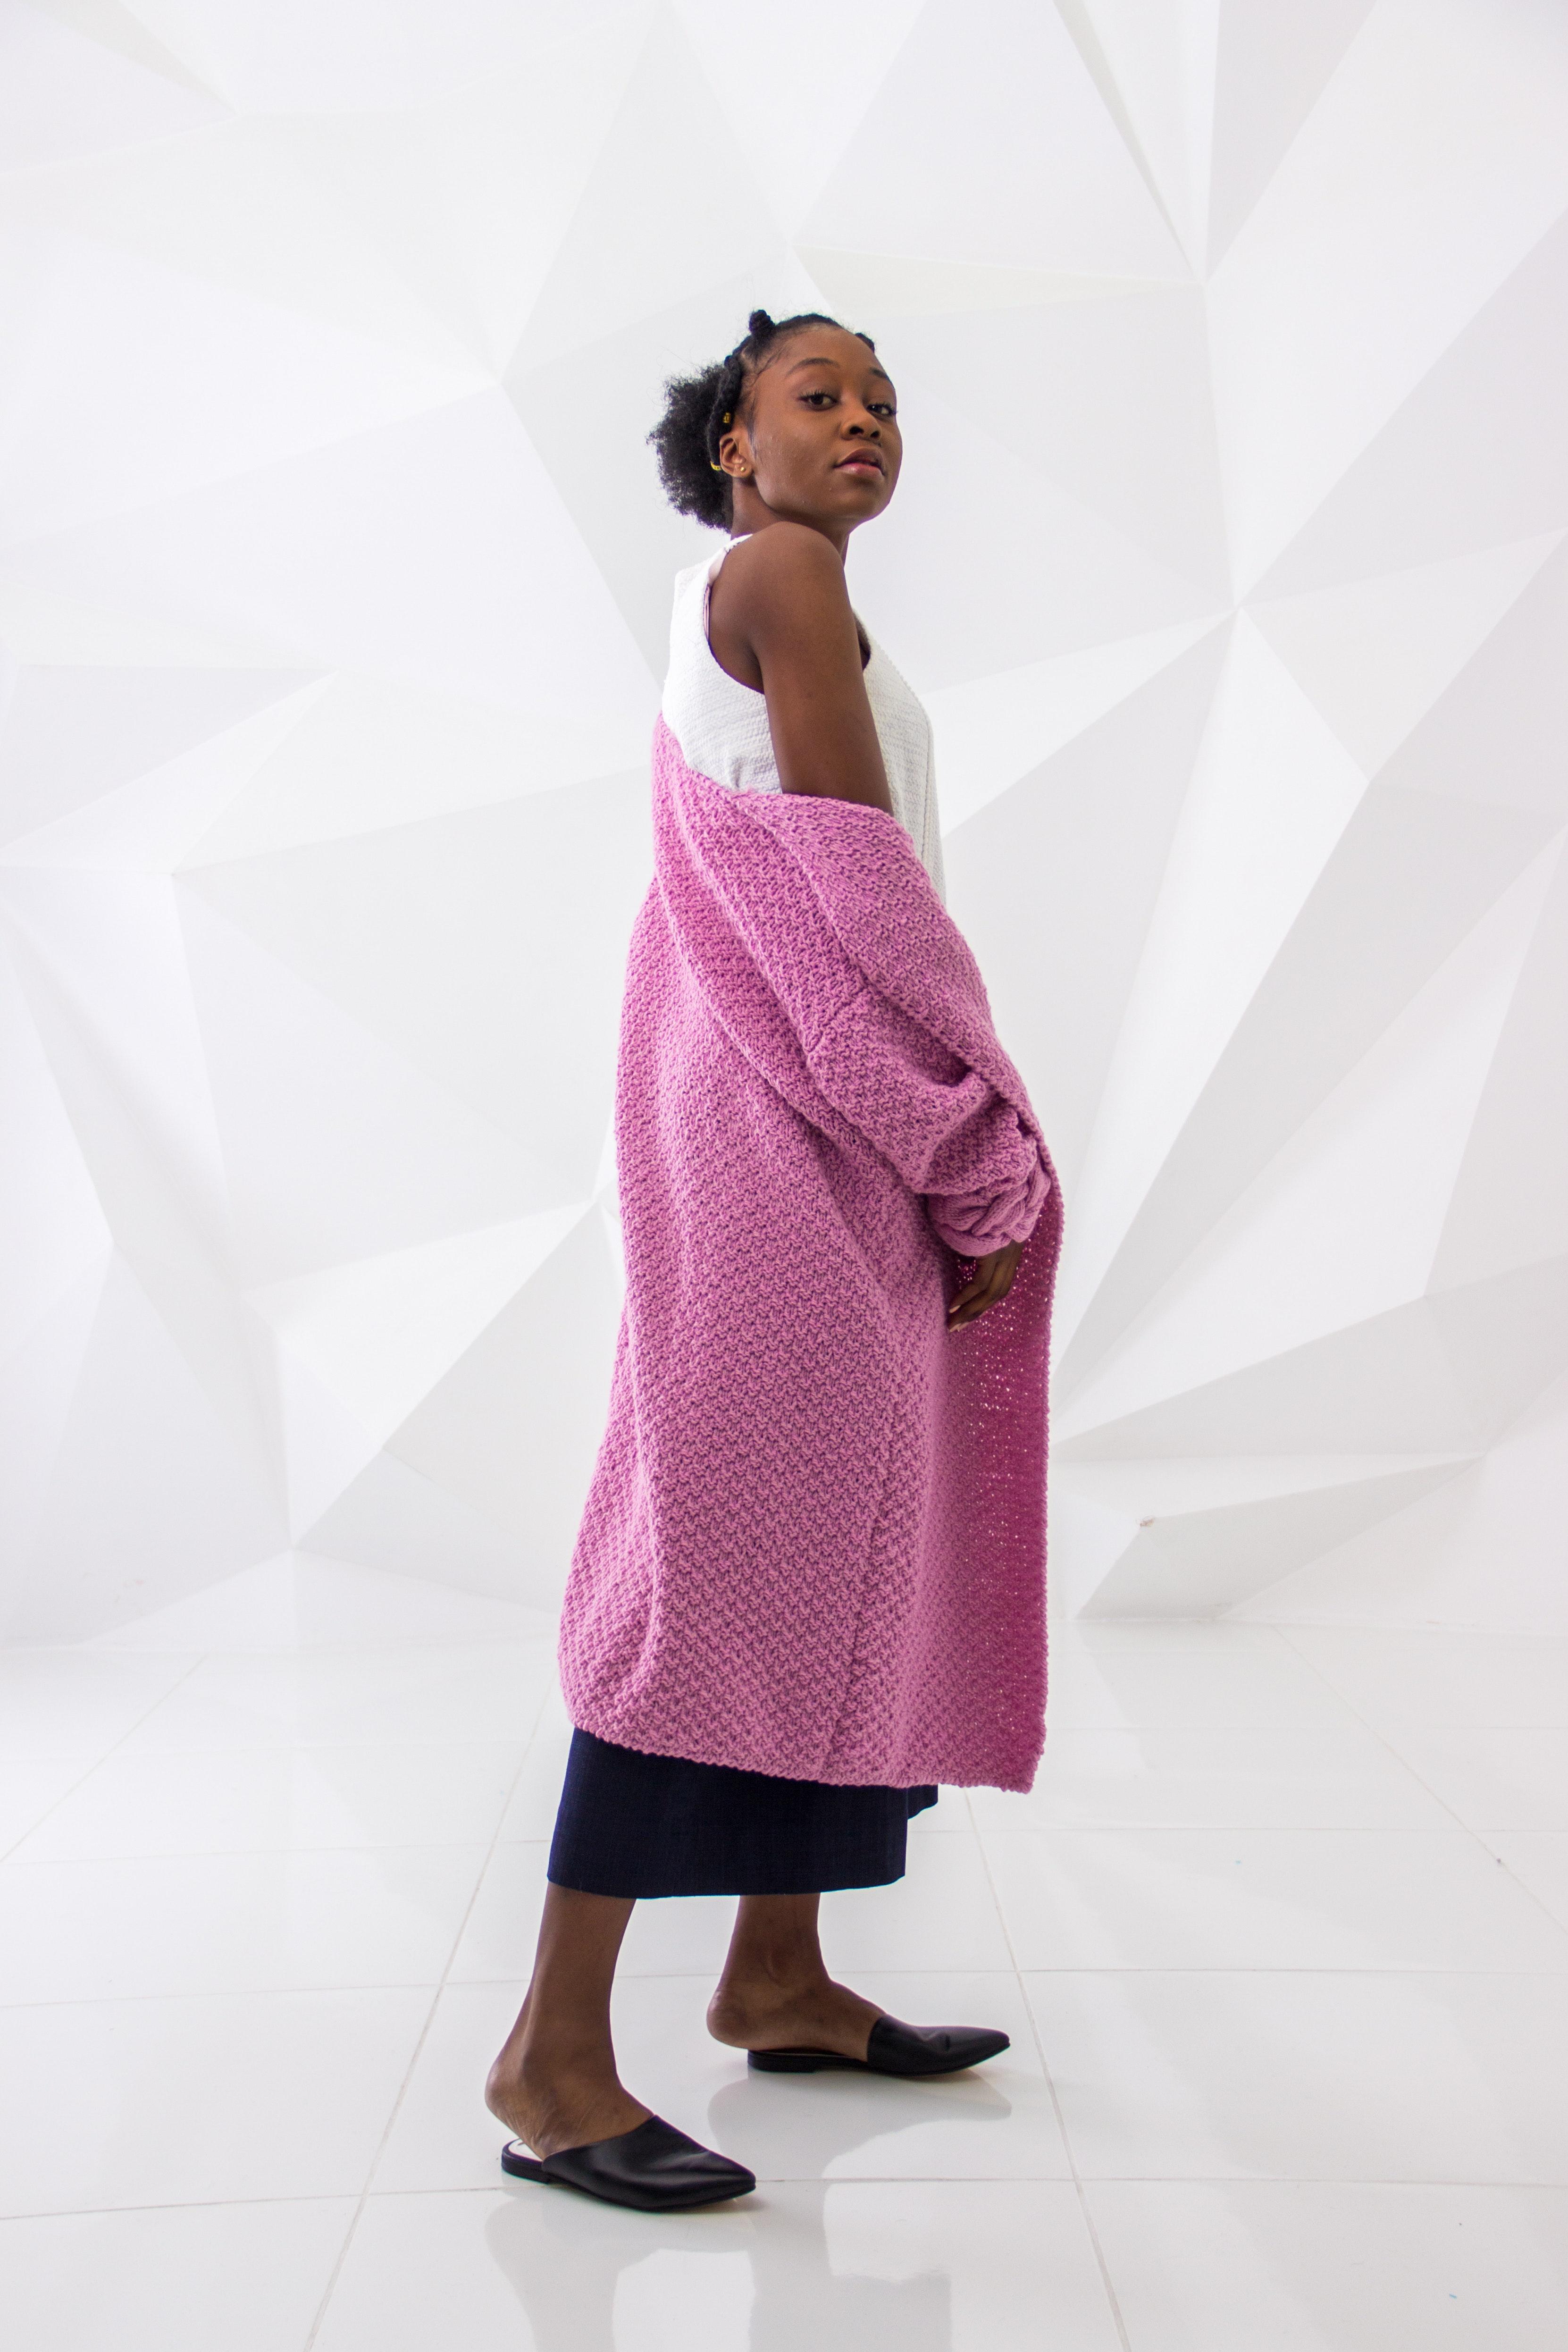 Woman Wearing White Sleeveless Dress and Pink Long Coa, Photo studio, Young, Woman, Wear, HQ Photo